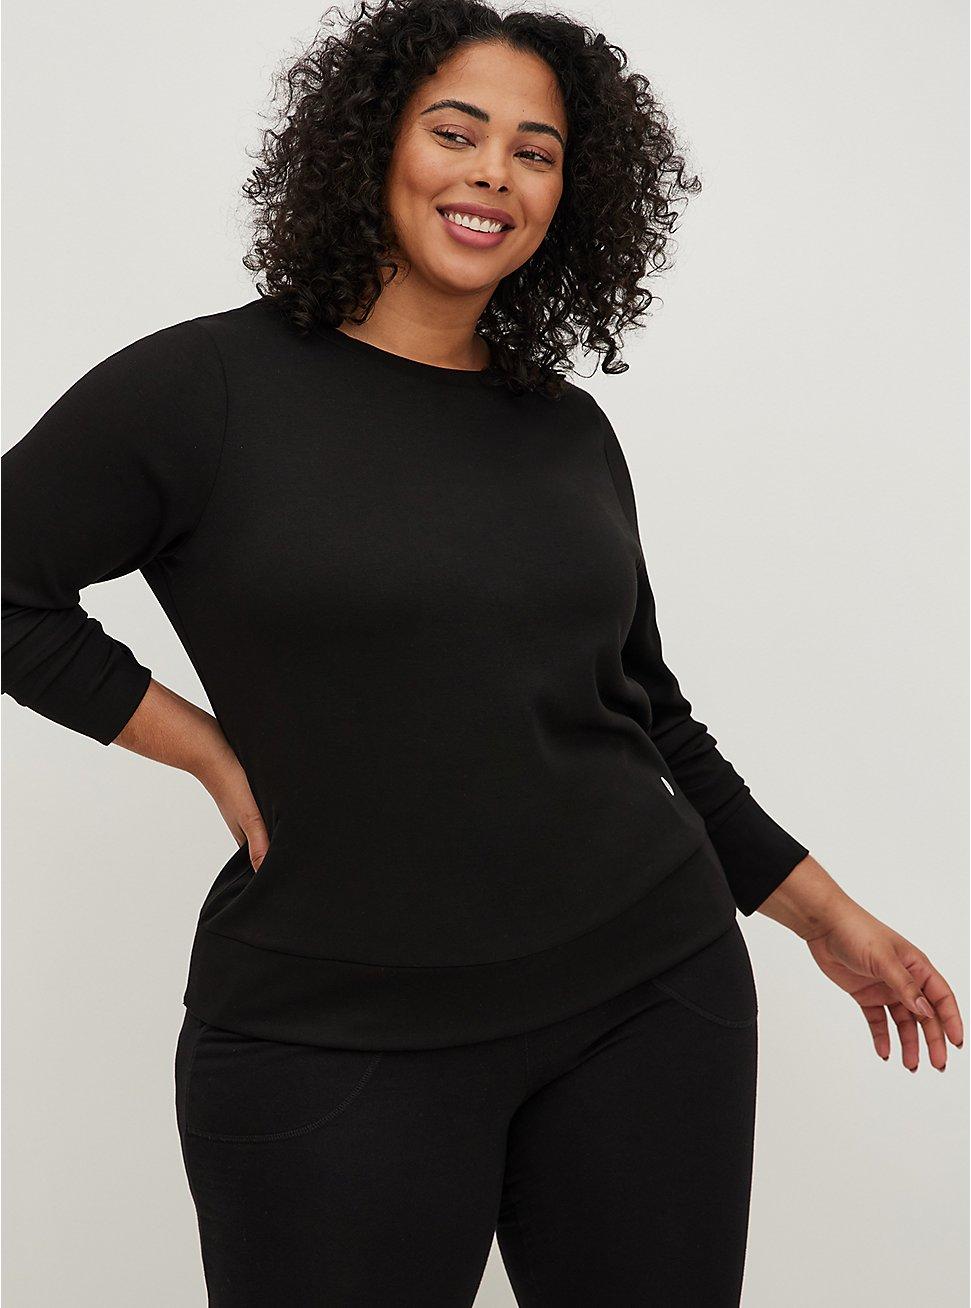 Plus Size Black Cupro Active Sweatshirt, BLACK, hi-res